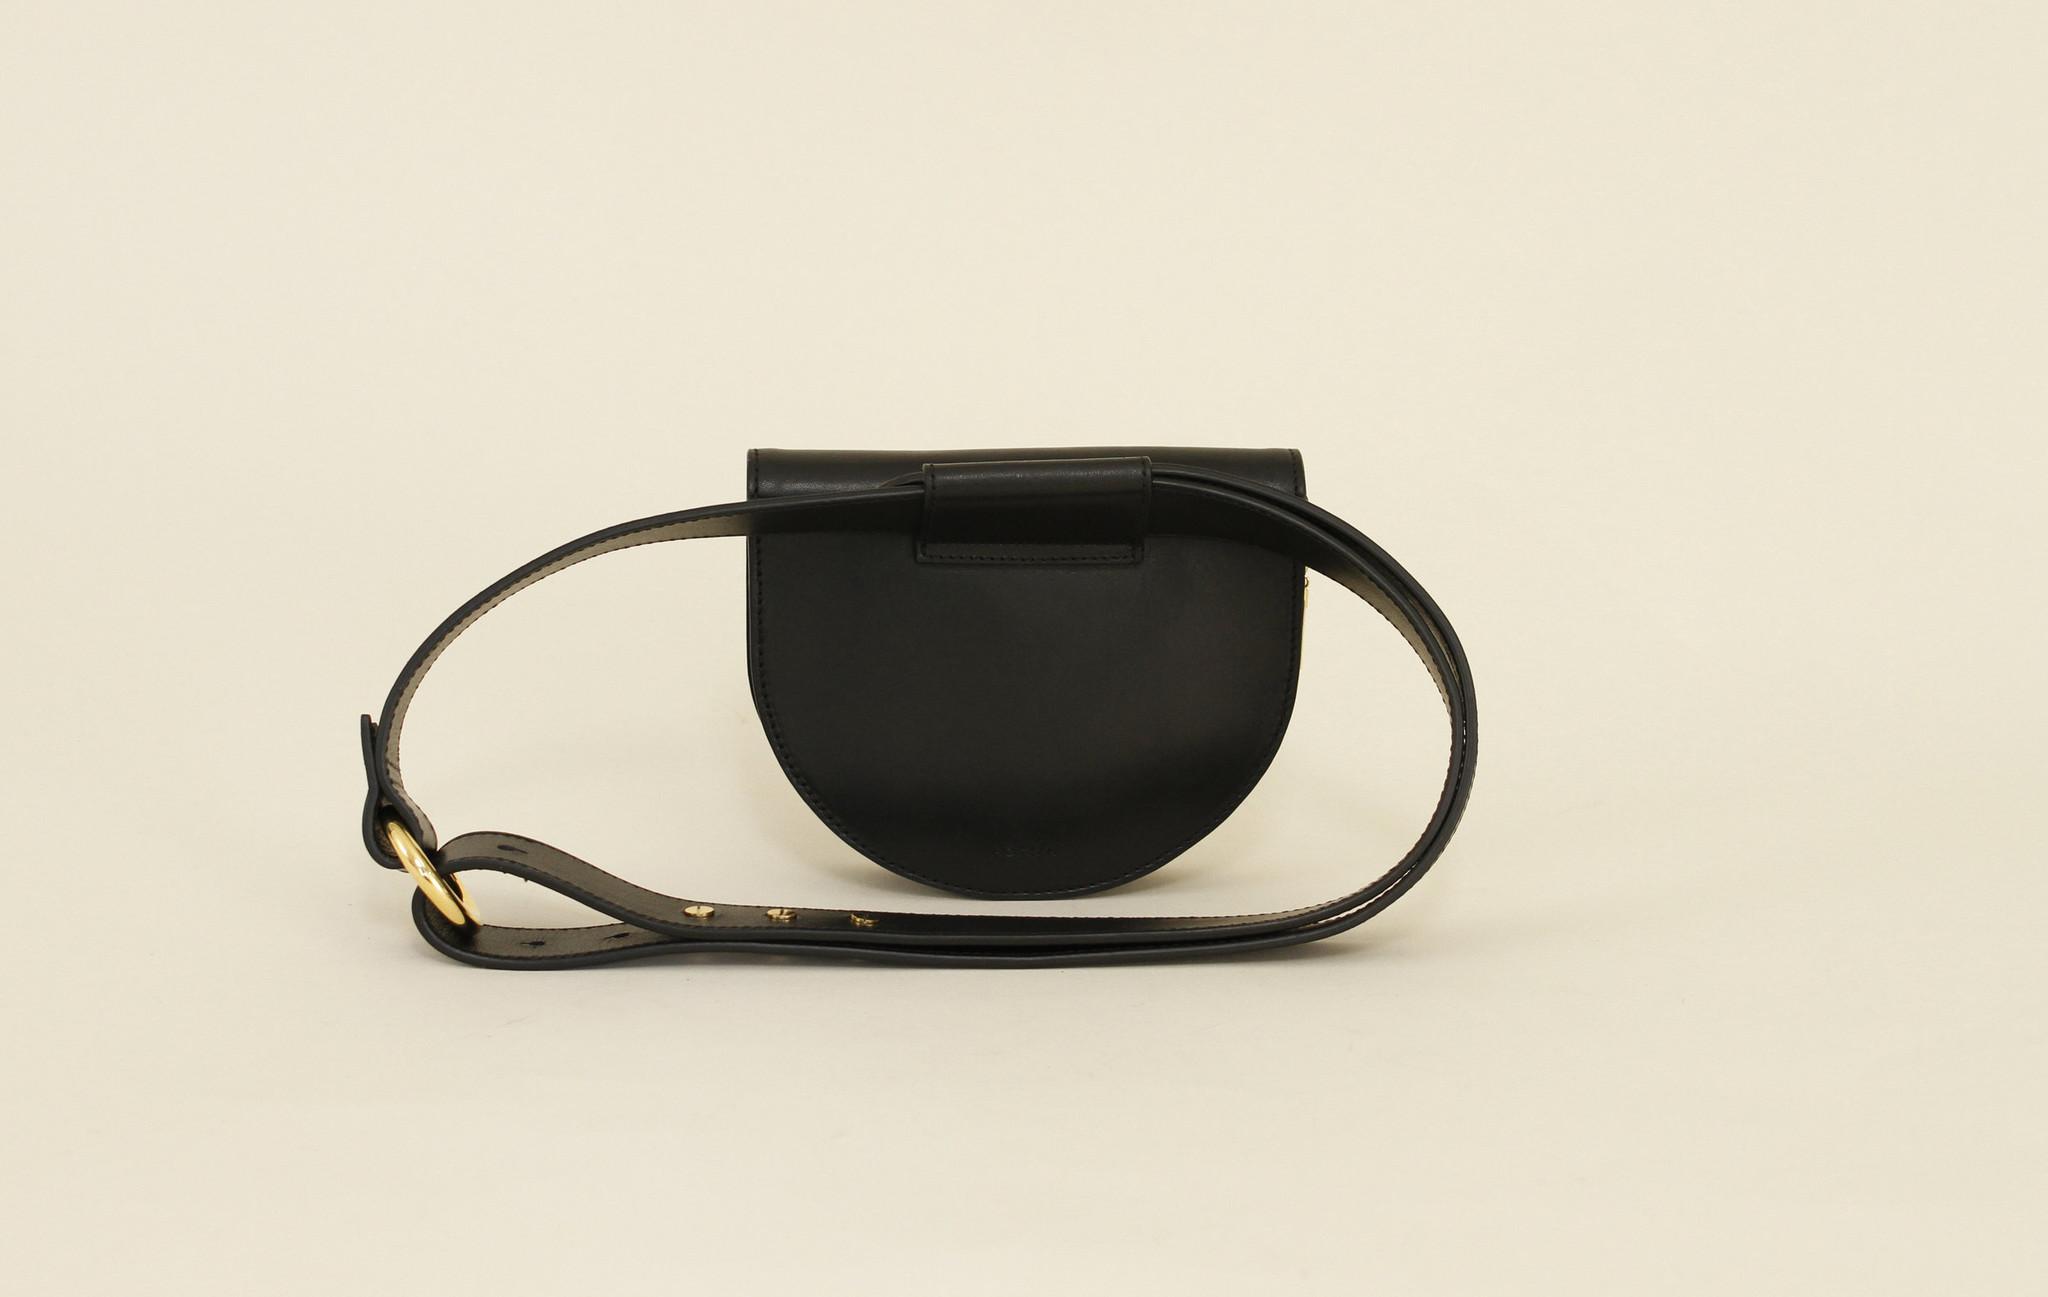 Palmetto Mini Belt Bag in Onyx